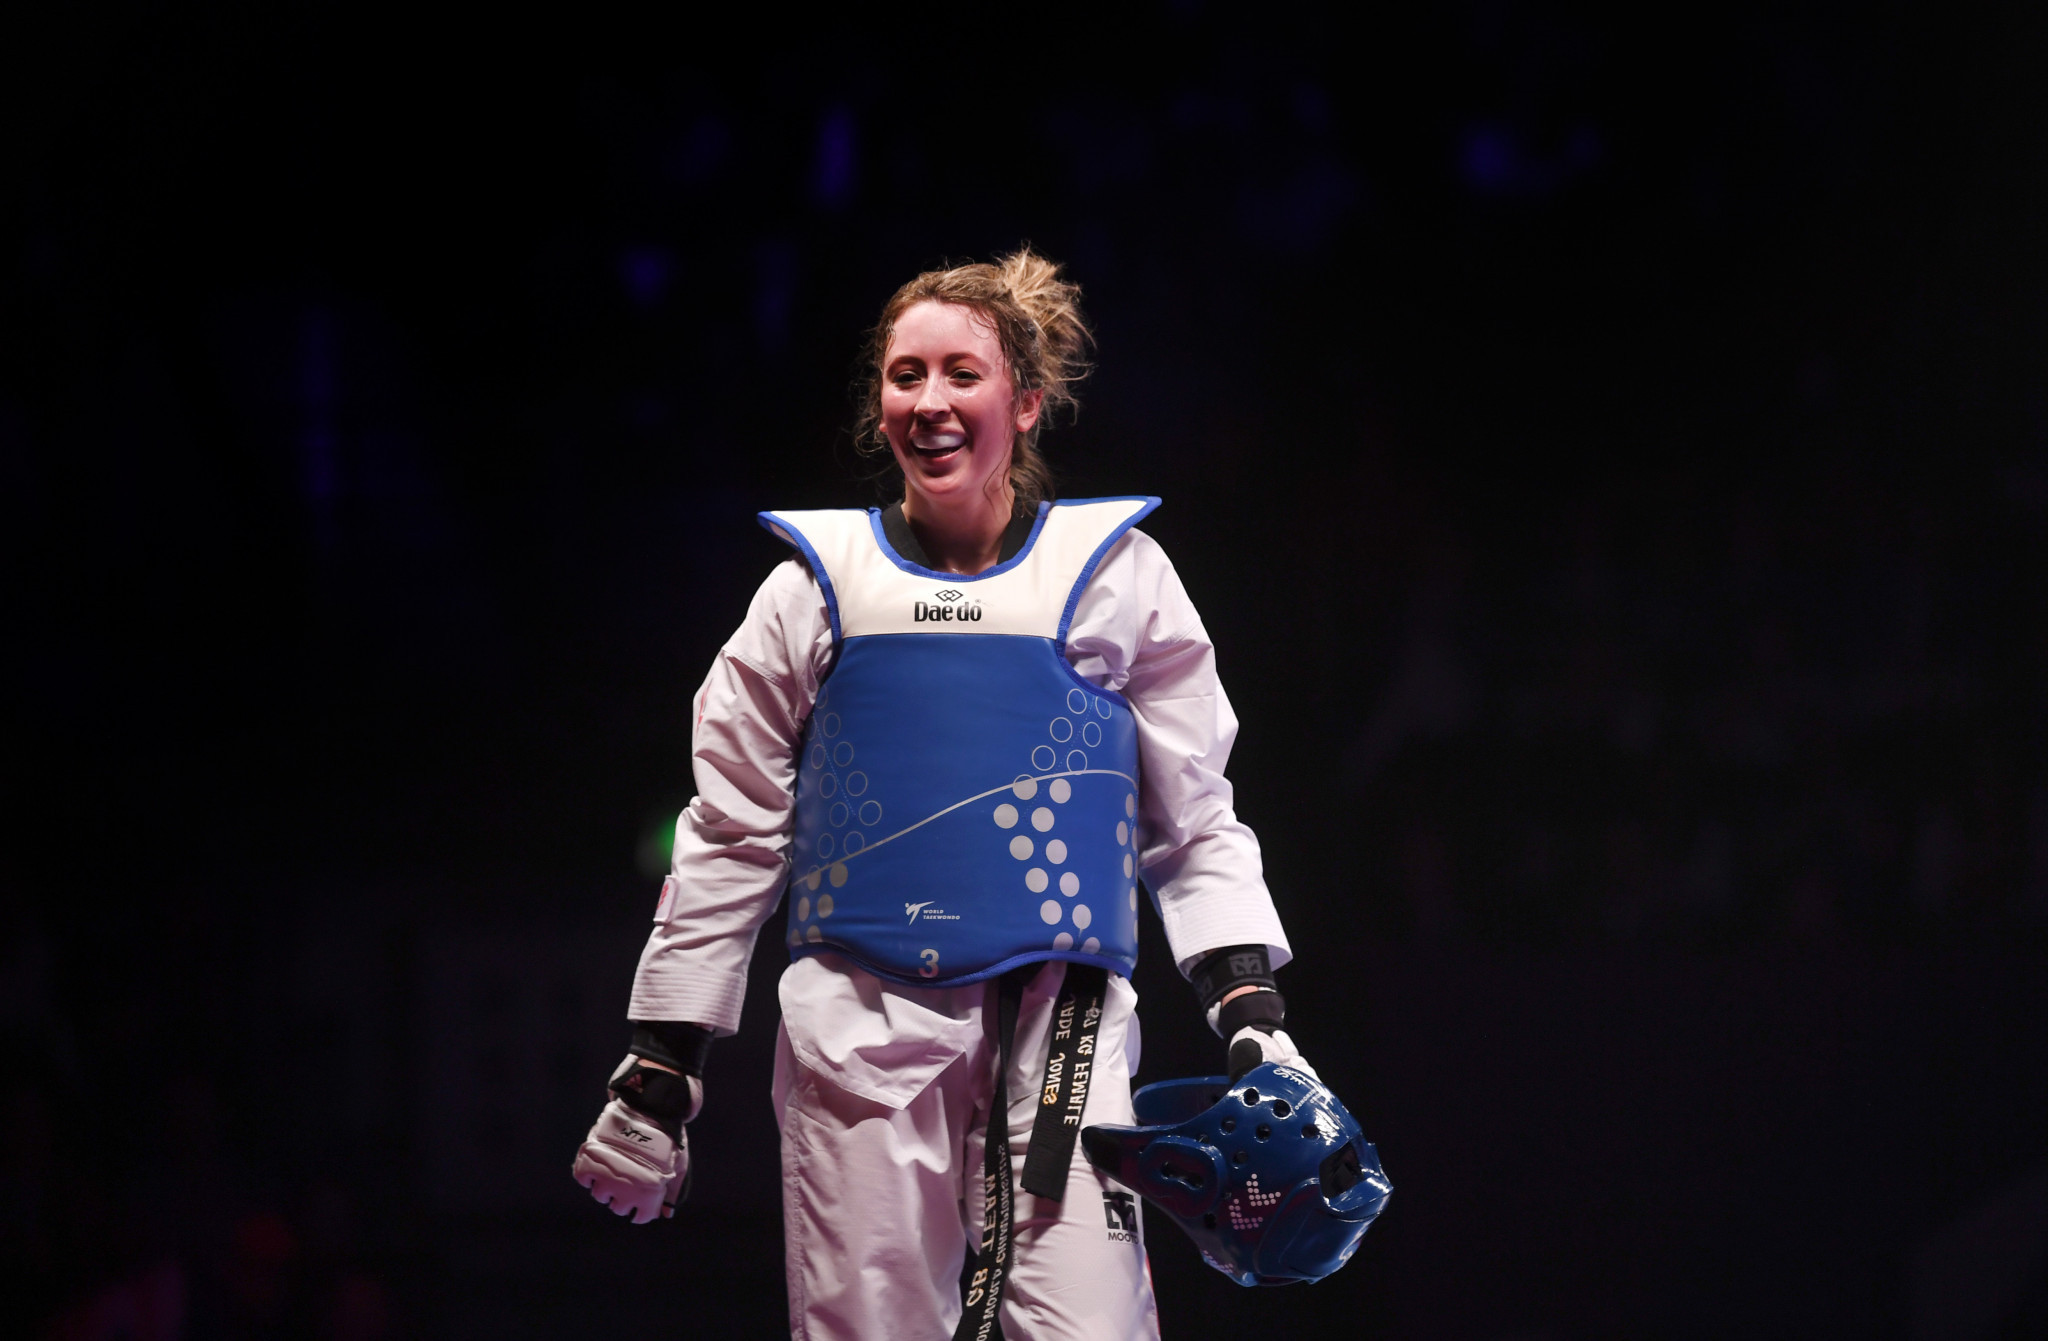 Olympic champion Jones retains European taekwondo title as Russia win two golds in Sofia